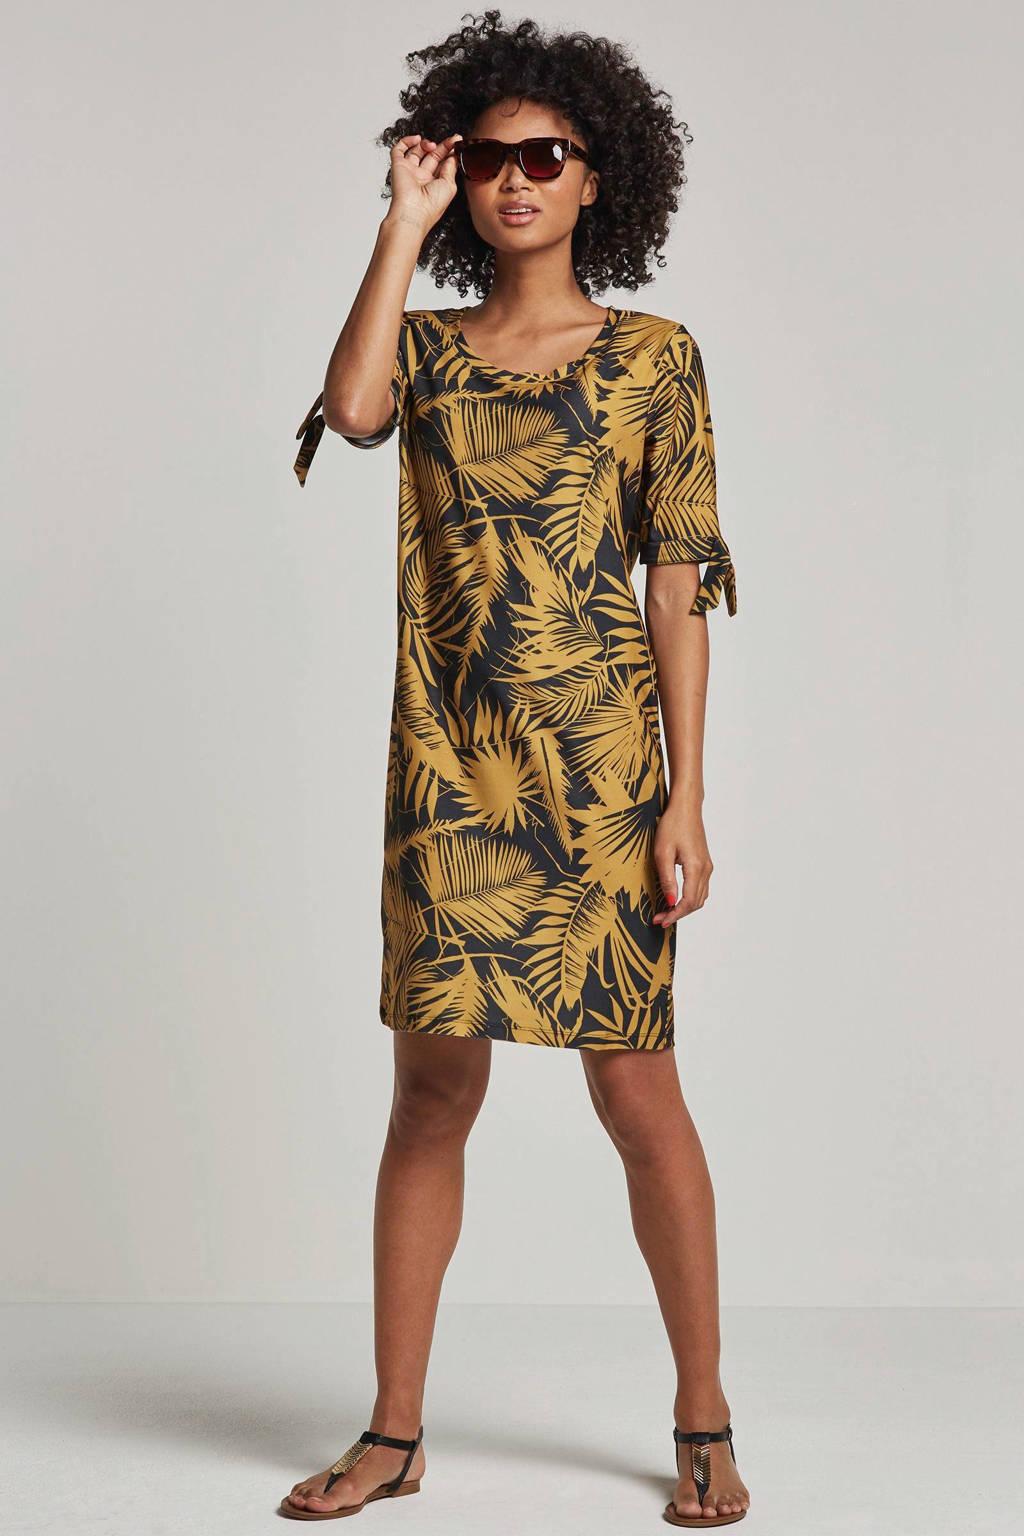 whkmp's beachwave jurk met palmprint, okergeel/zwart